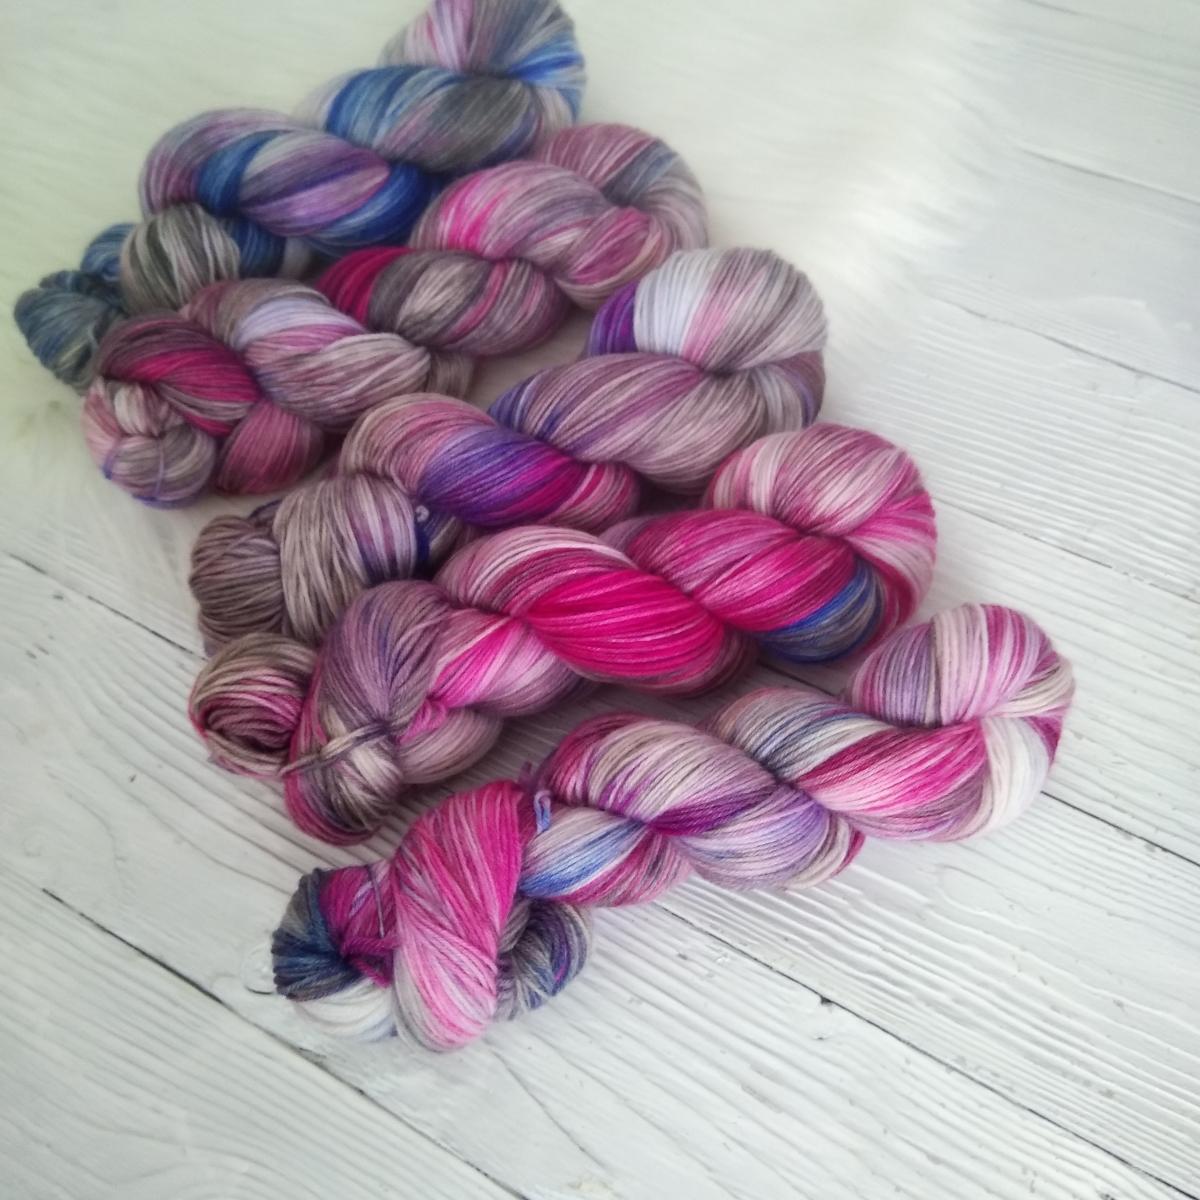 woodico.pro hand dyed yarn 034 6 1200x1200 - Hand dyed yarn / 034